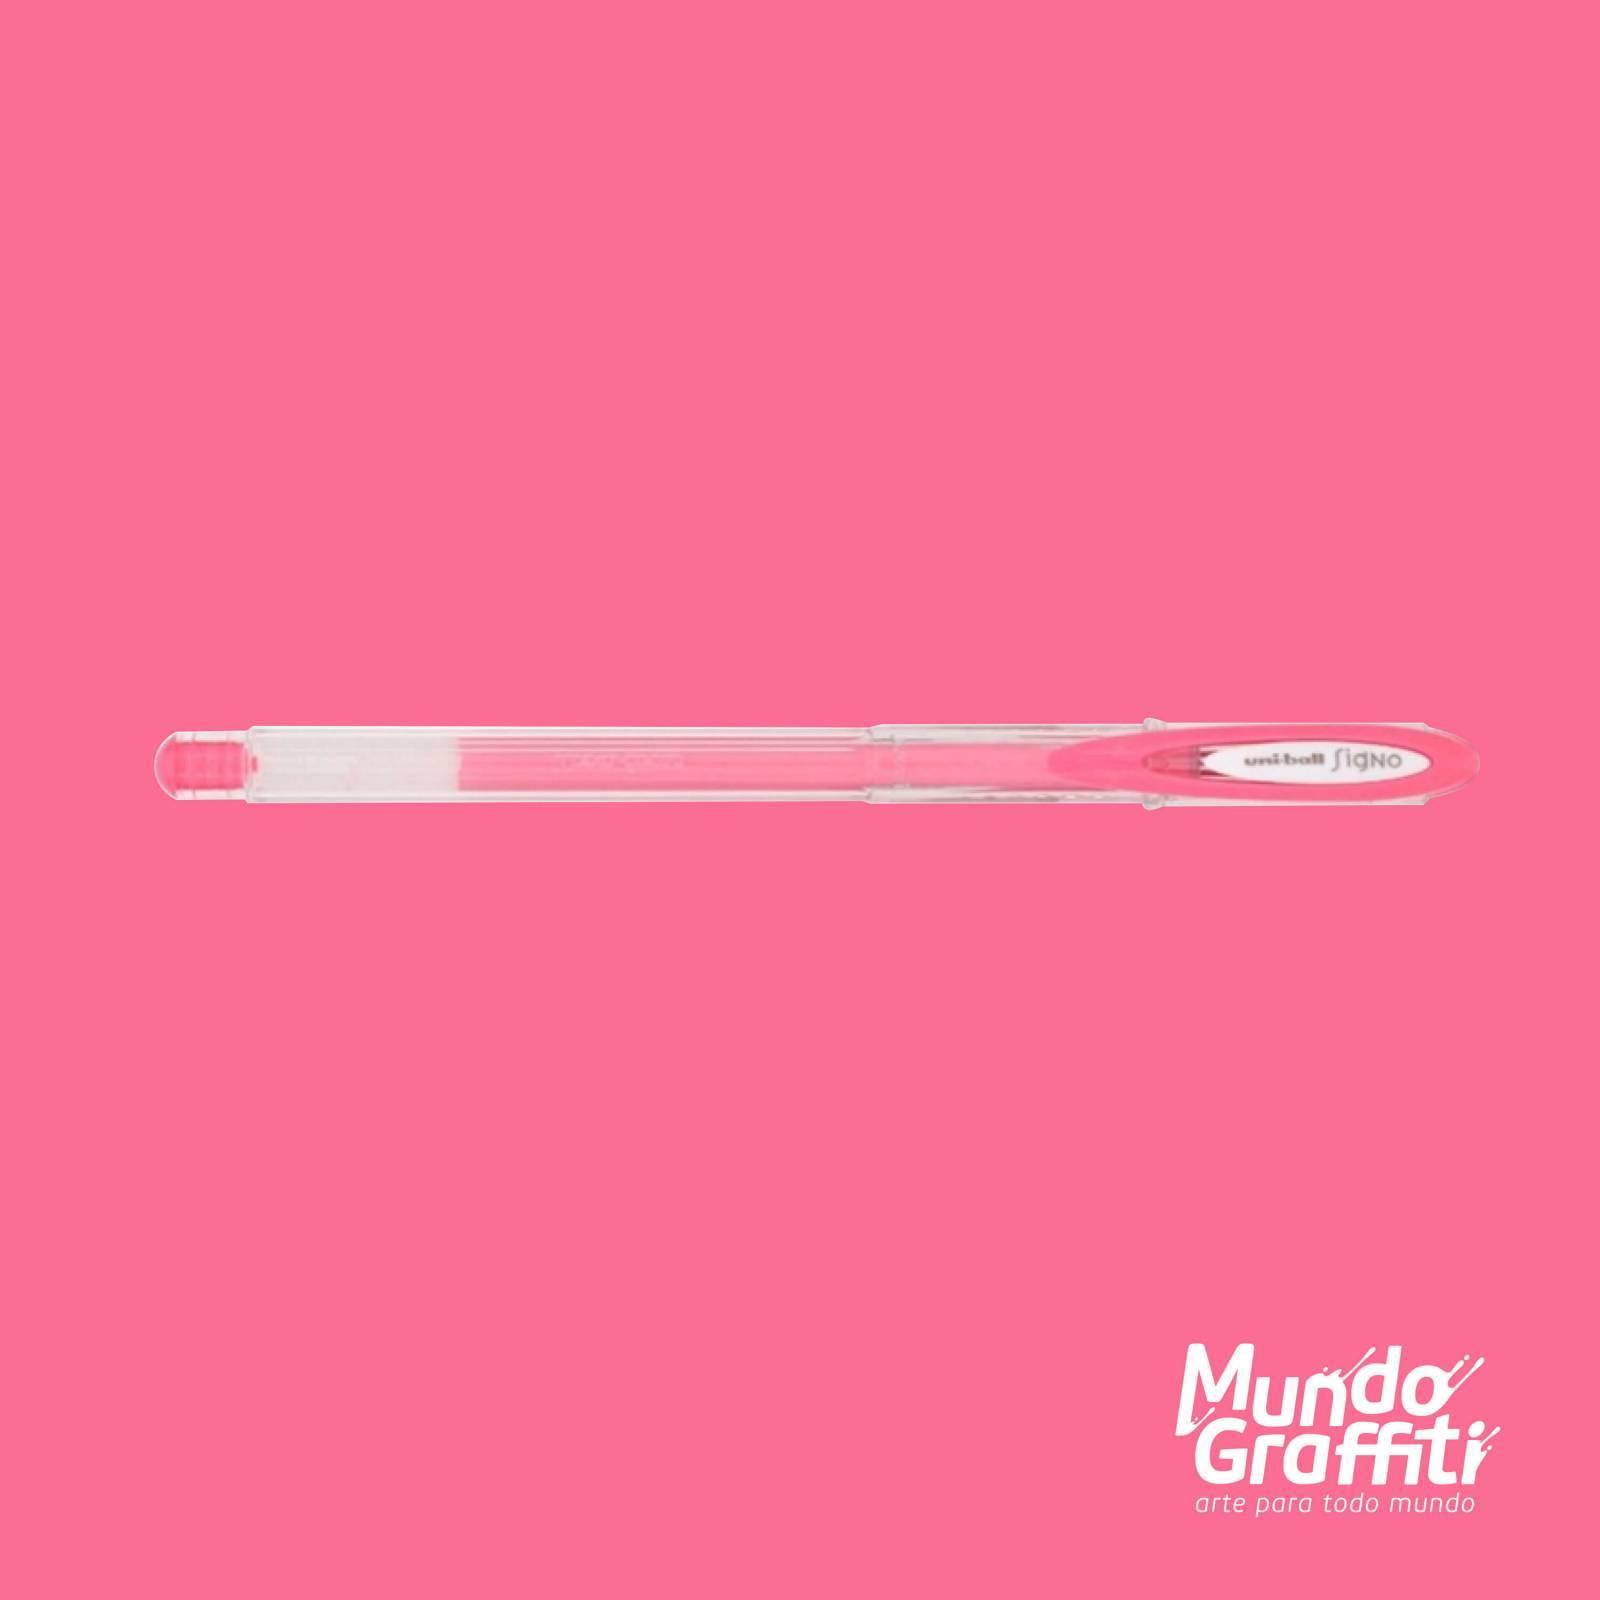 Caneta Signo Gel Angelic Color Pastel Rosa 0,7mm - Mundo Graffiti